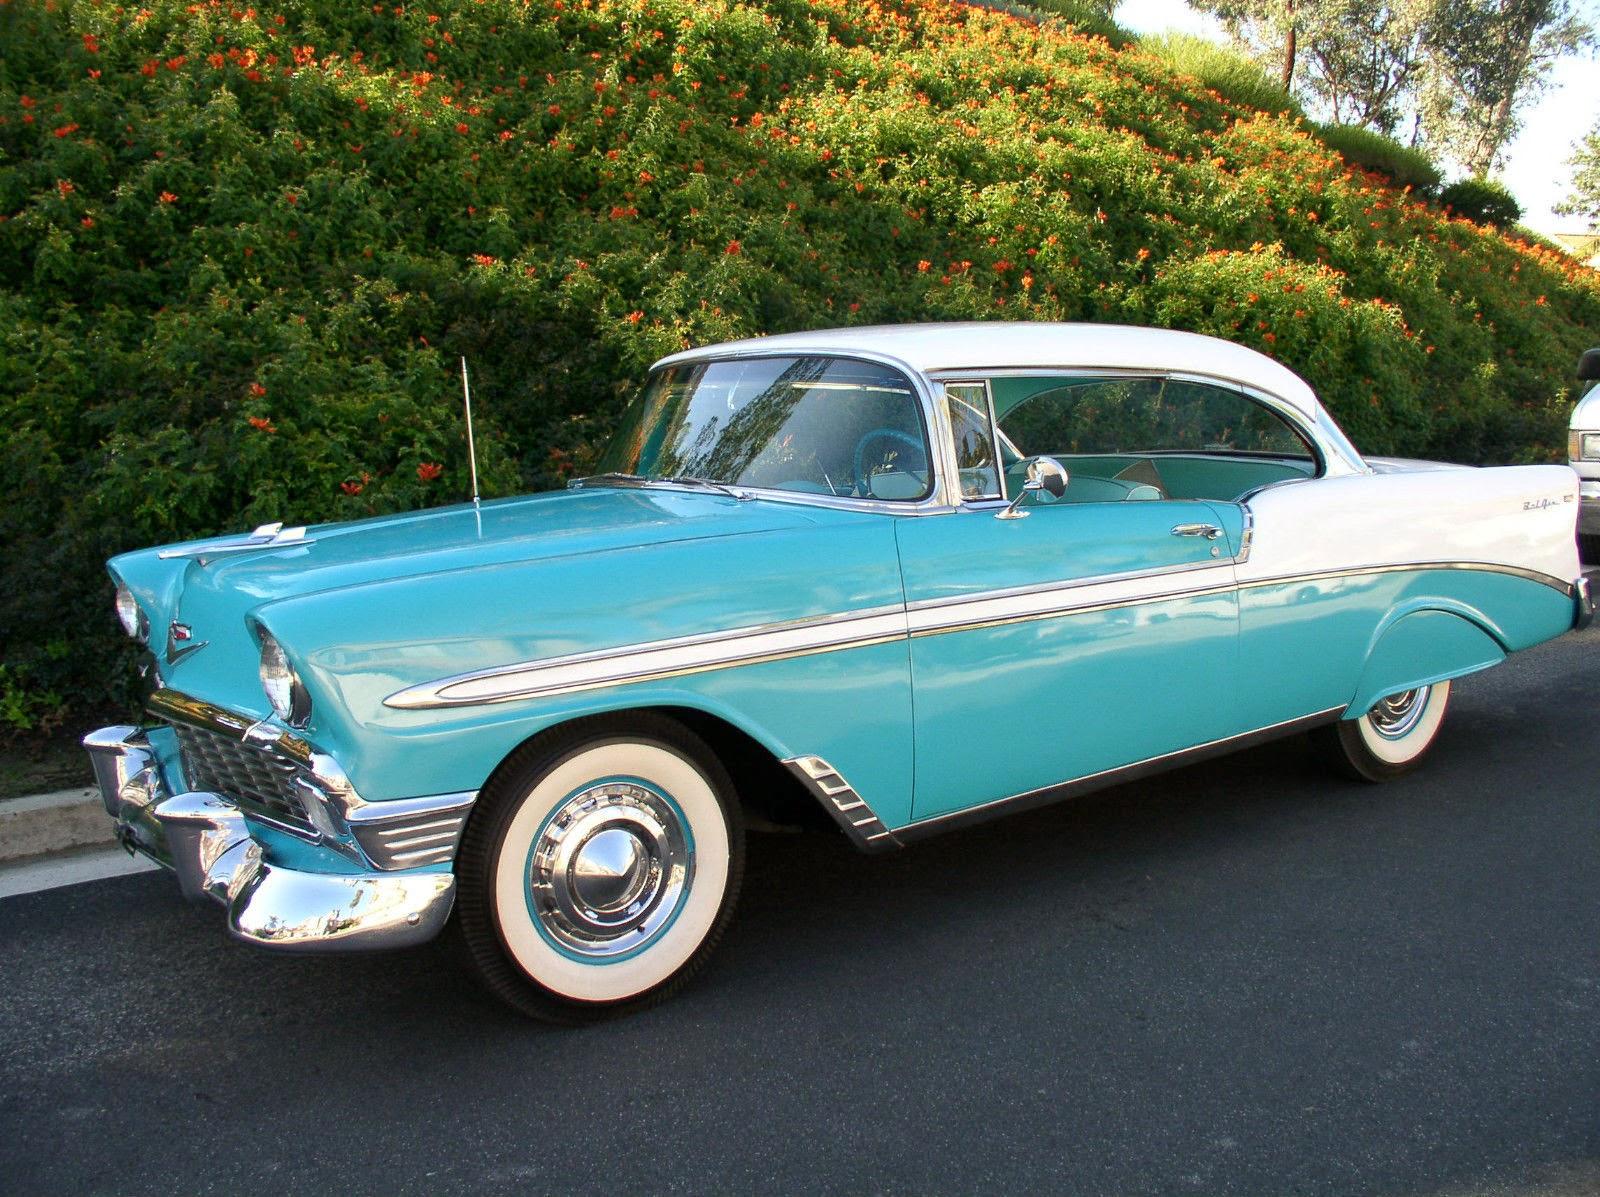 all american classic cars 1956 chevrolet bel air 2 door hardtop sport coupe. Black Bedroom Furniture Sets. Home Design Ideas